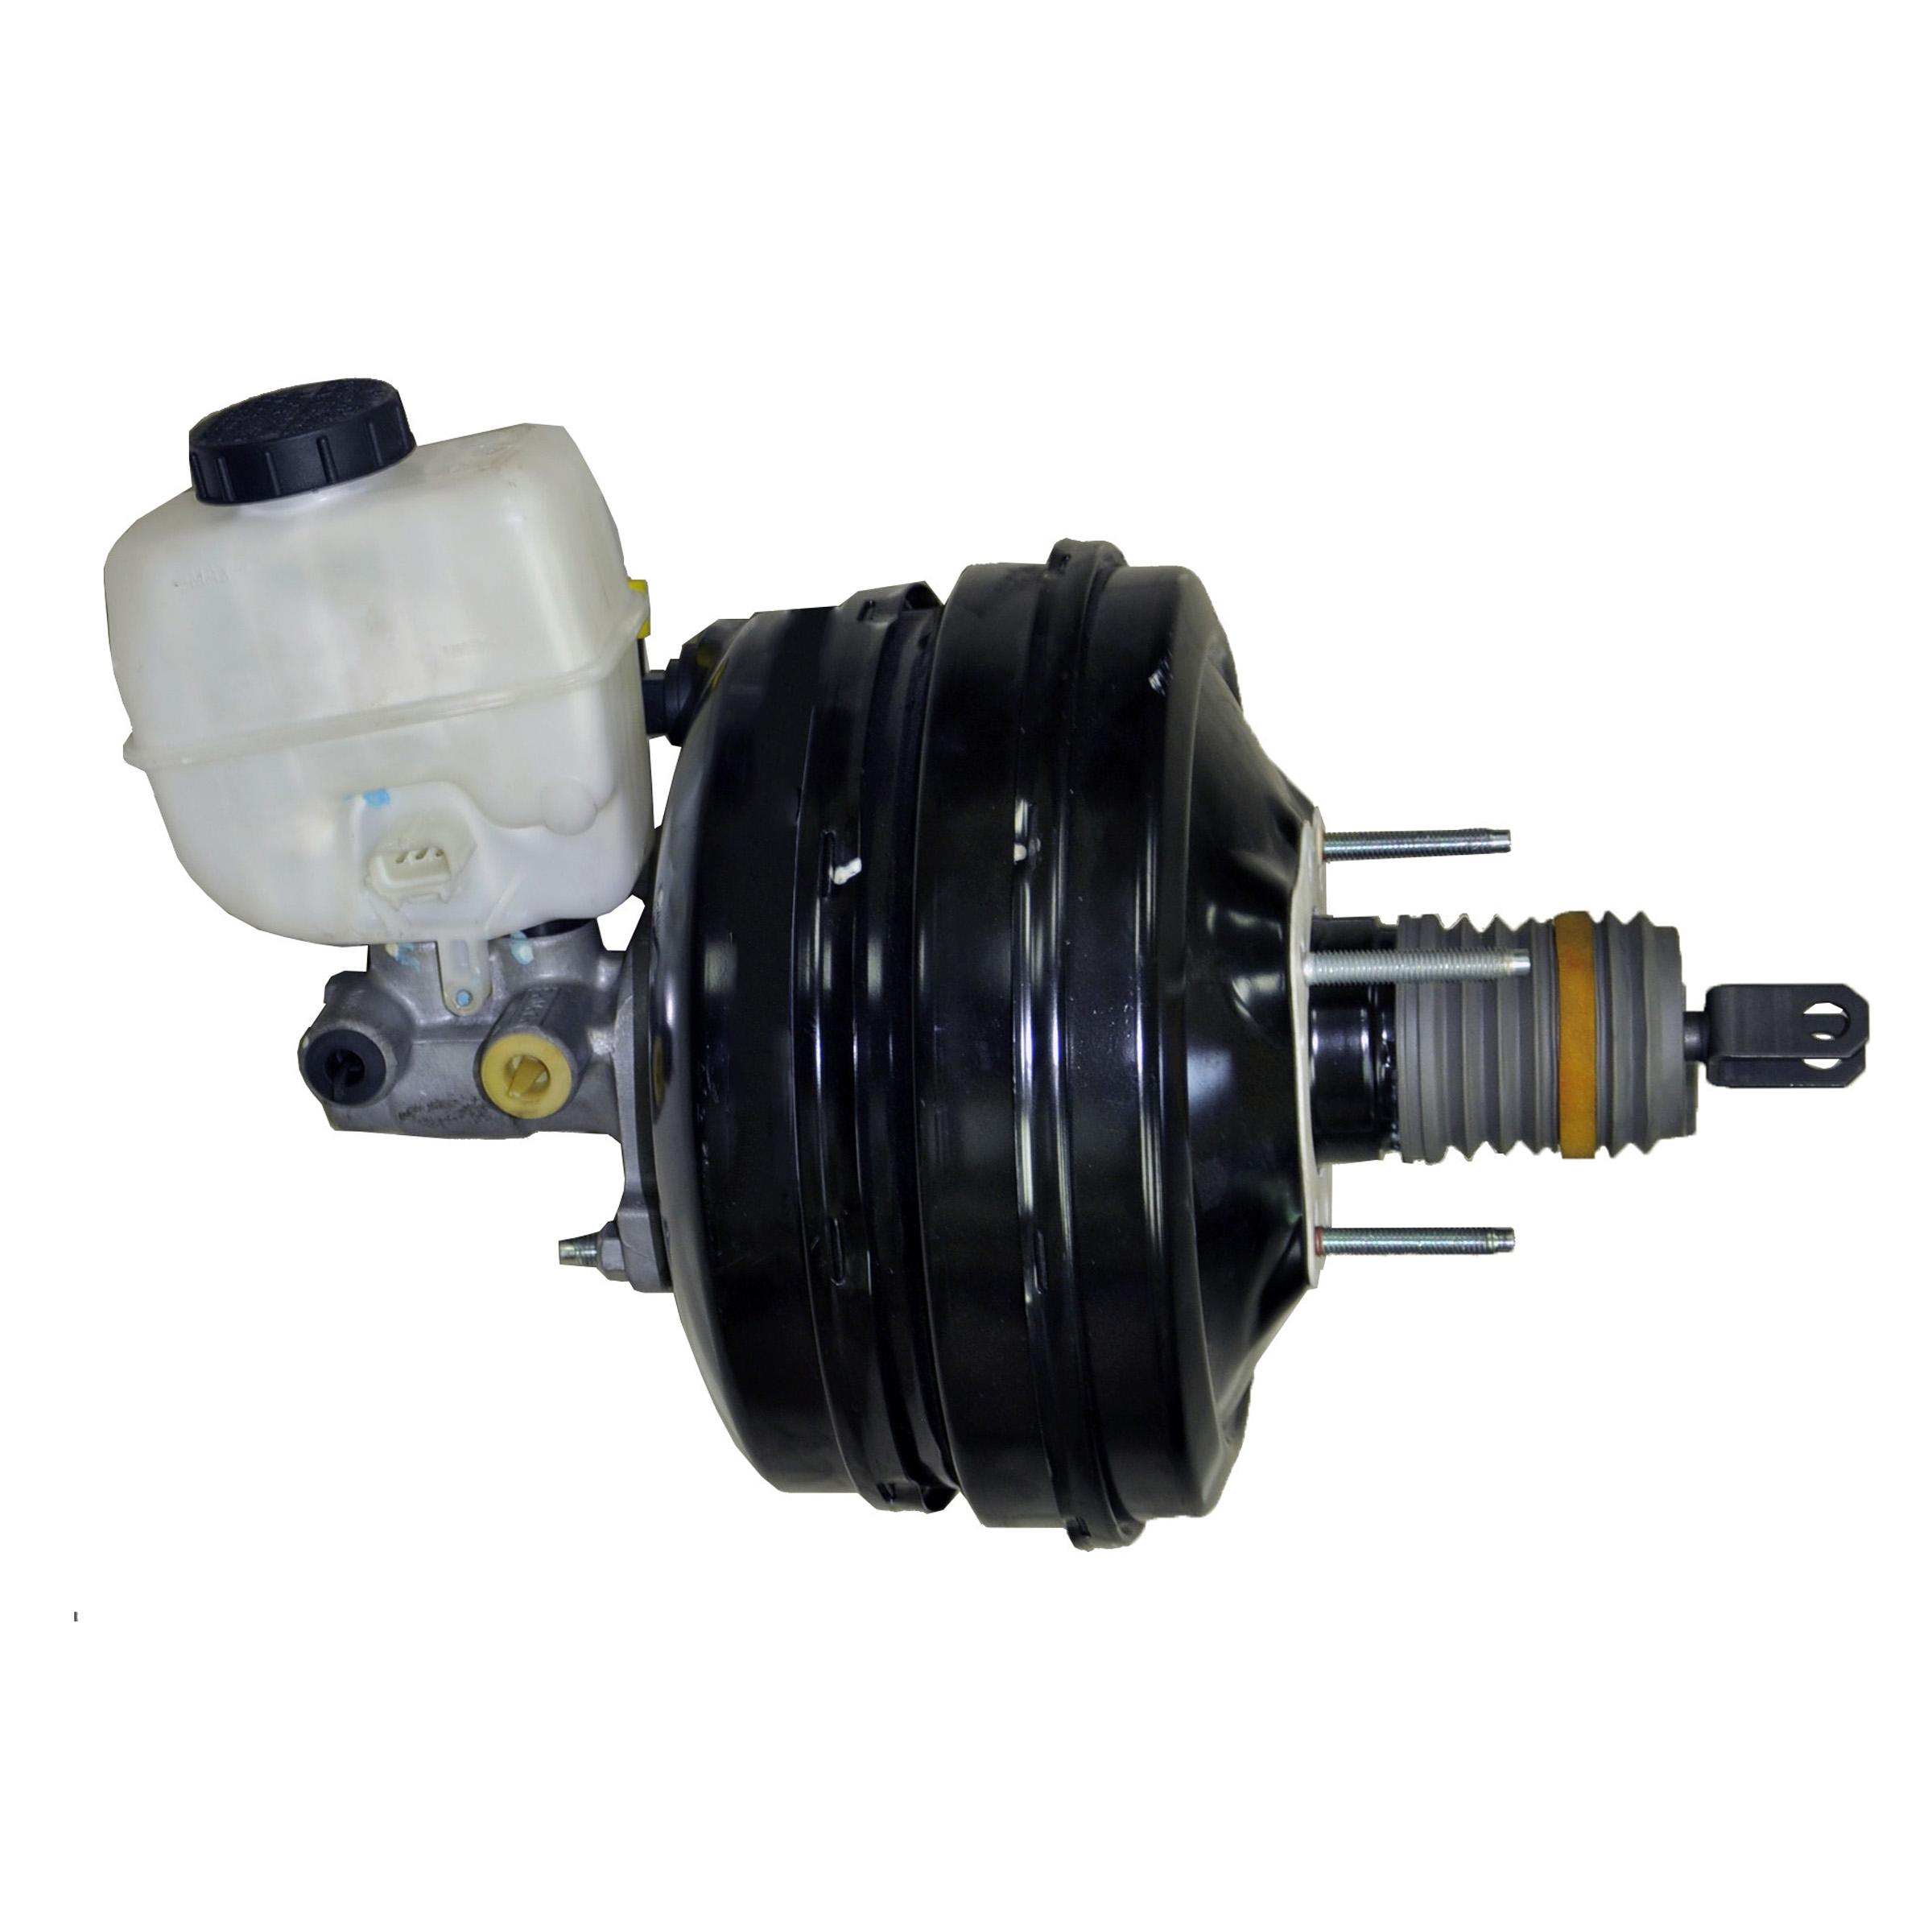 New Herko Power Brake Booster With Master Cylinder /& Reservoir For Ford 09-13